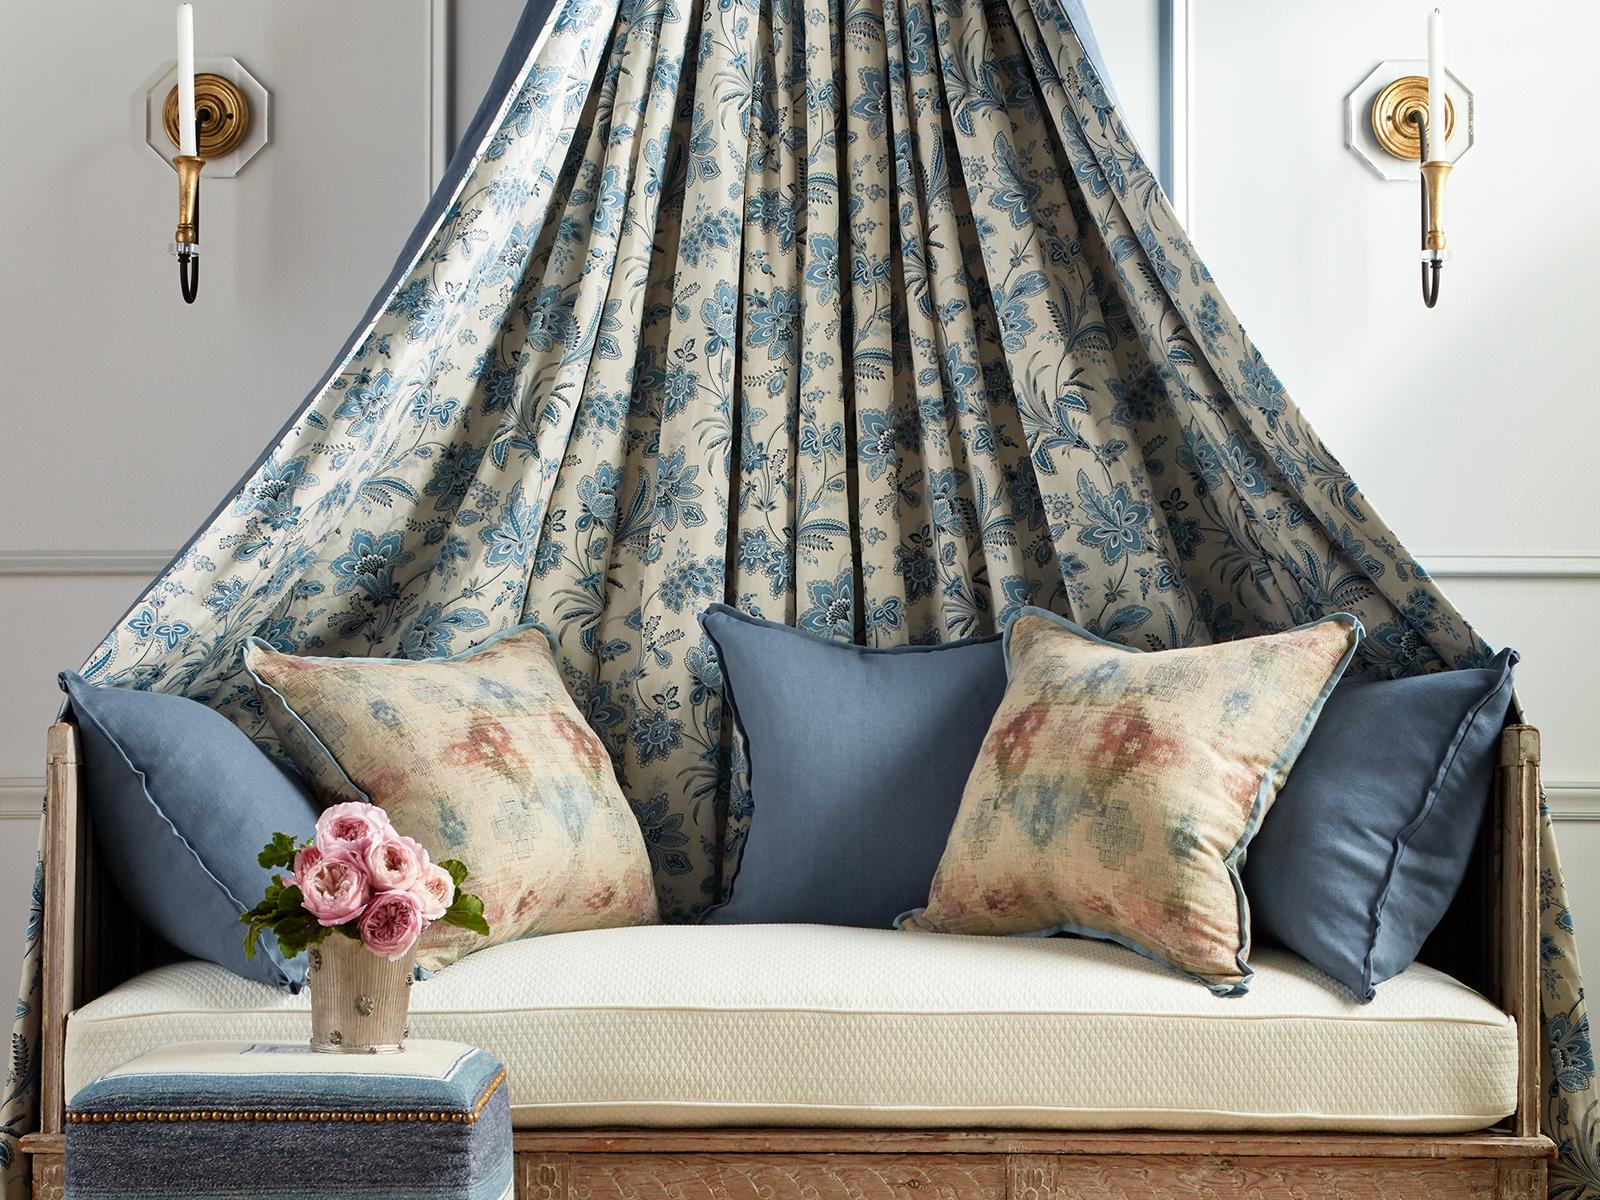 hodsoll mckenzie designer fabric stockist london fabric company uk. Black Bedroom Furniture Sets. Home Design Ideas